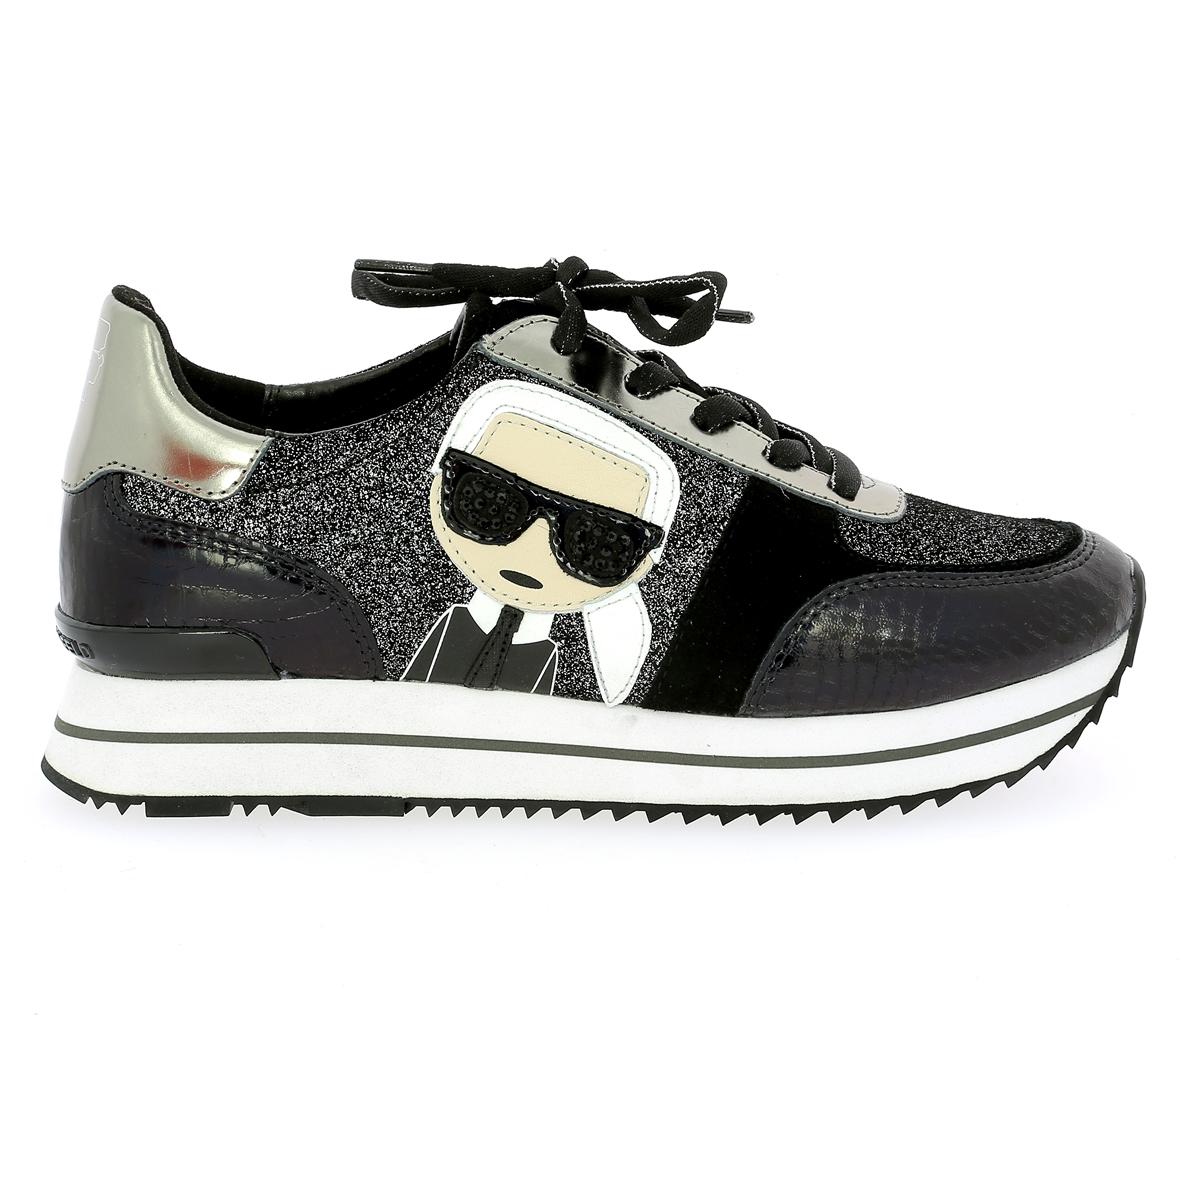 Karl Lagerfeld Sneakers zwart